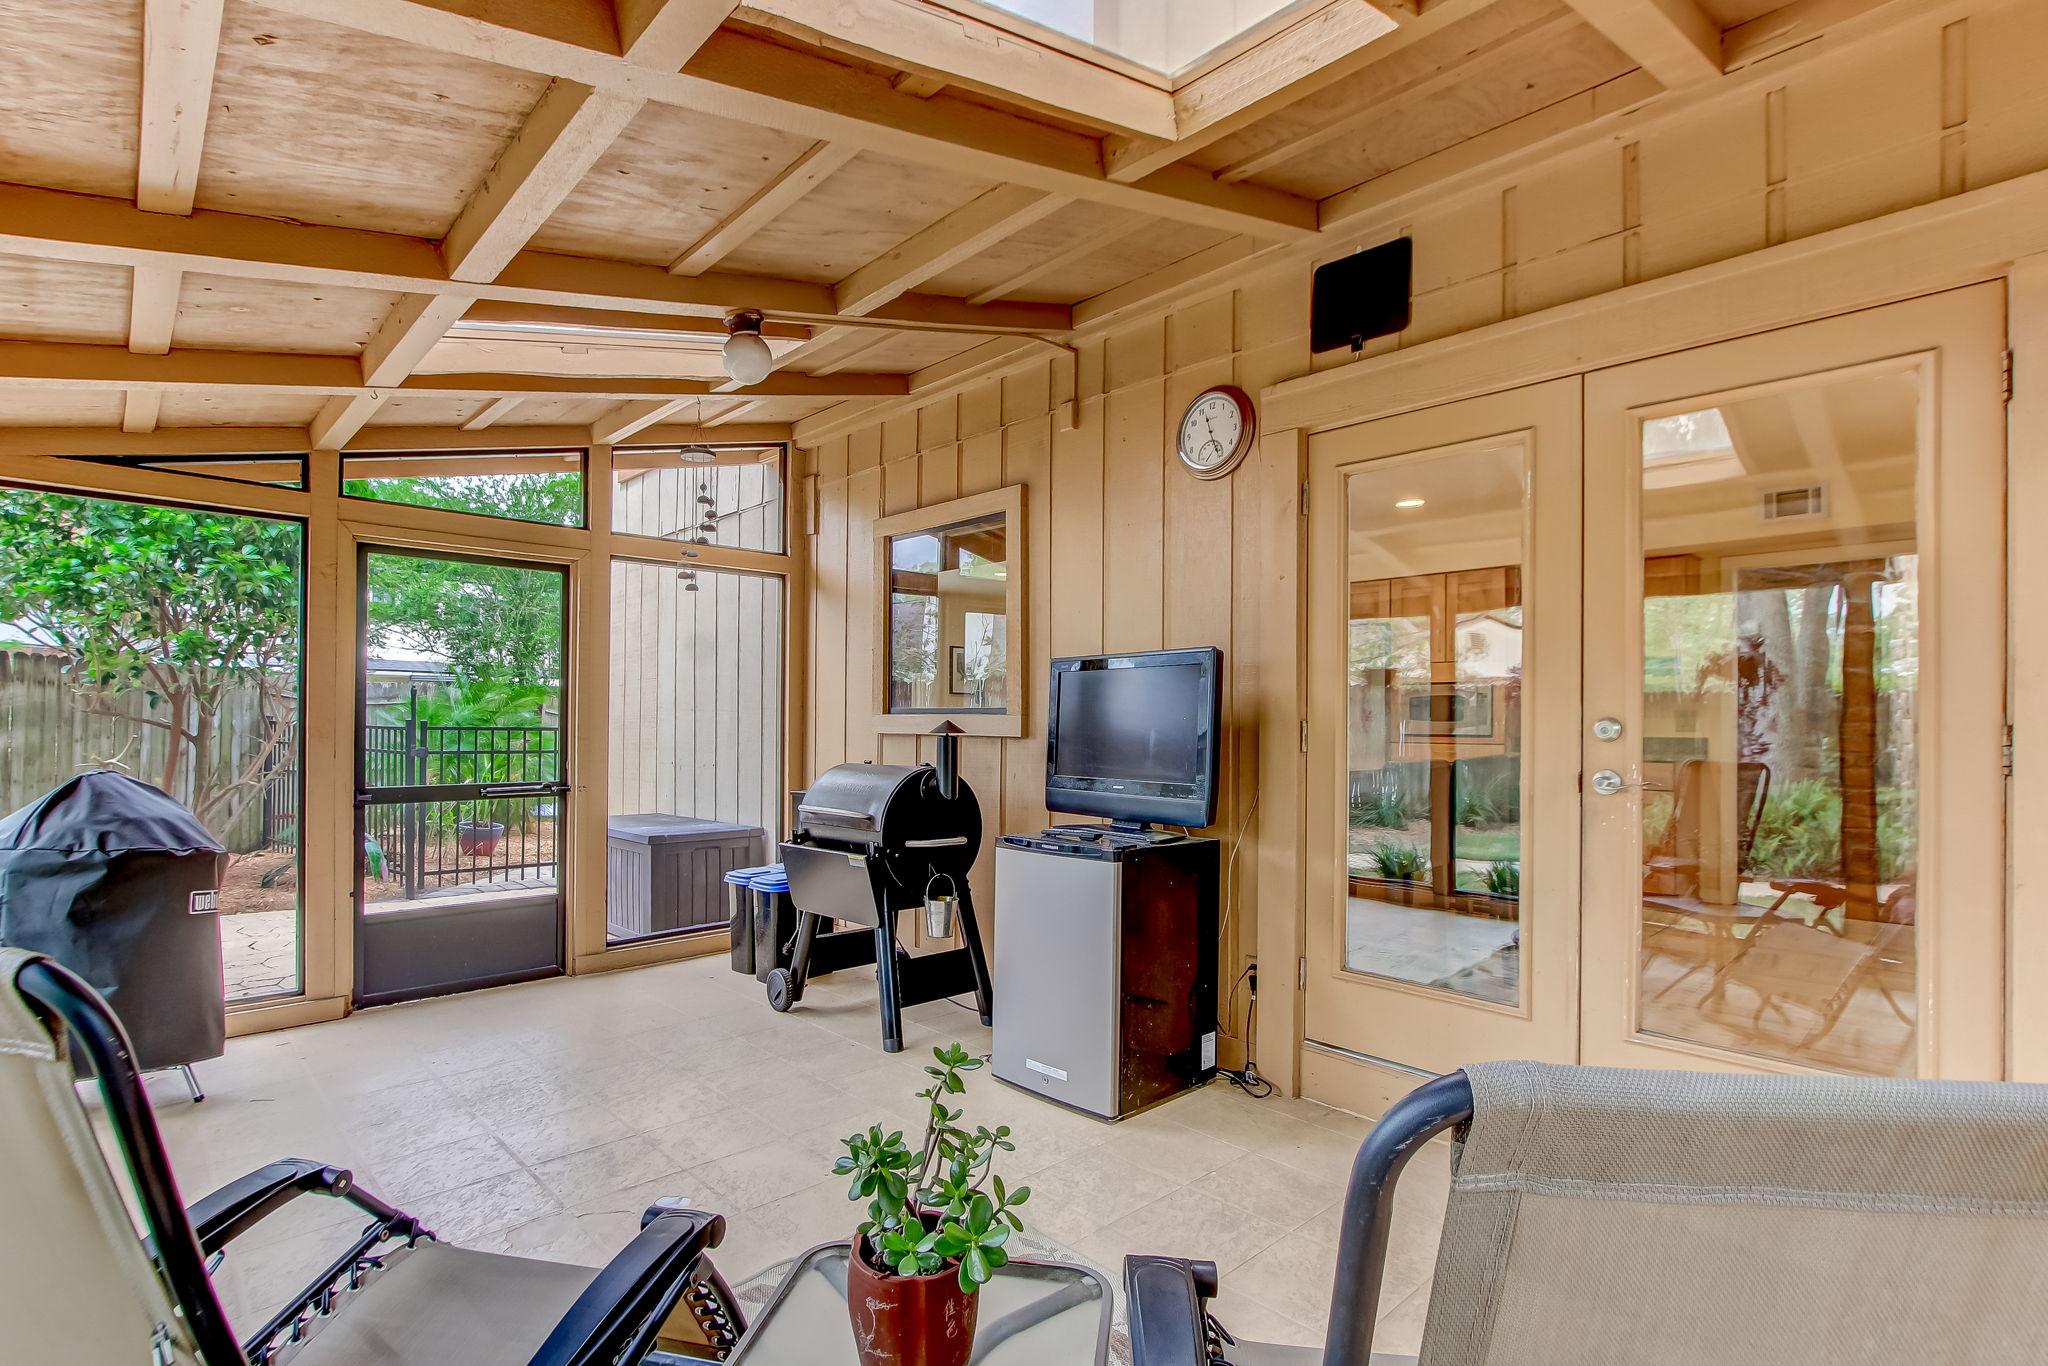 Screened Porch Outside Breakfast Nook/Kitchen